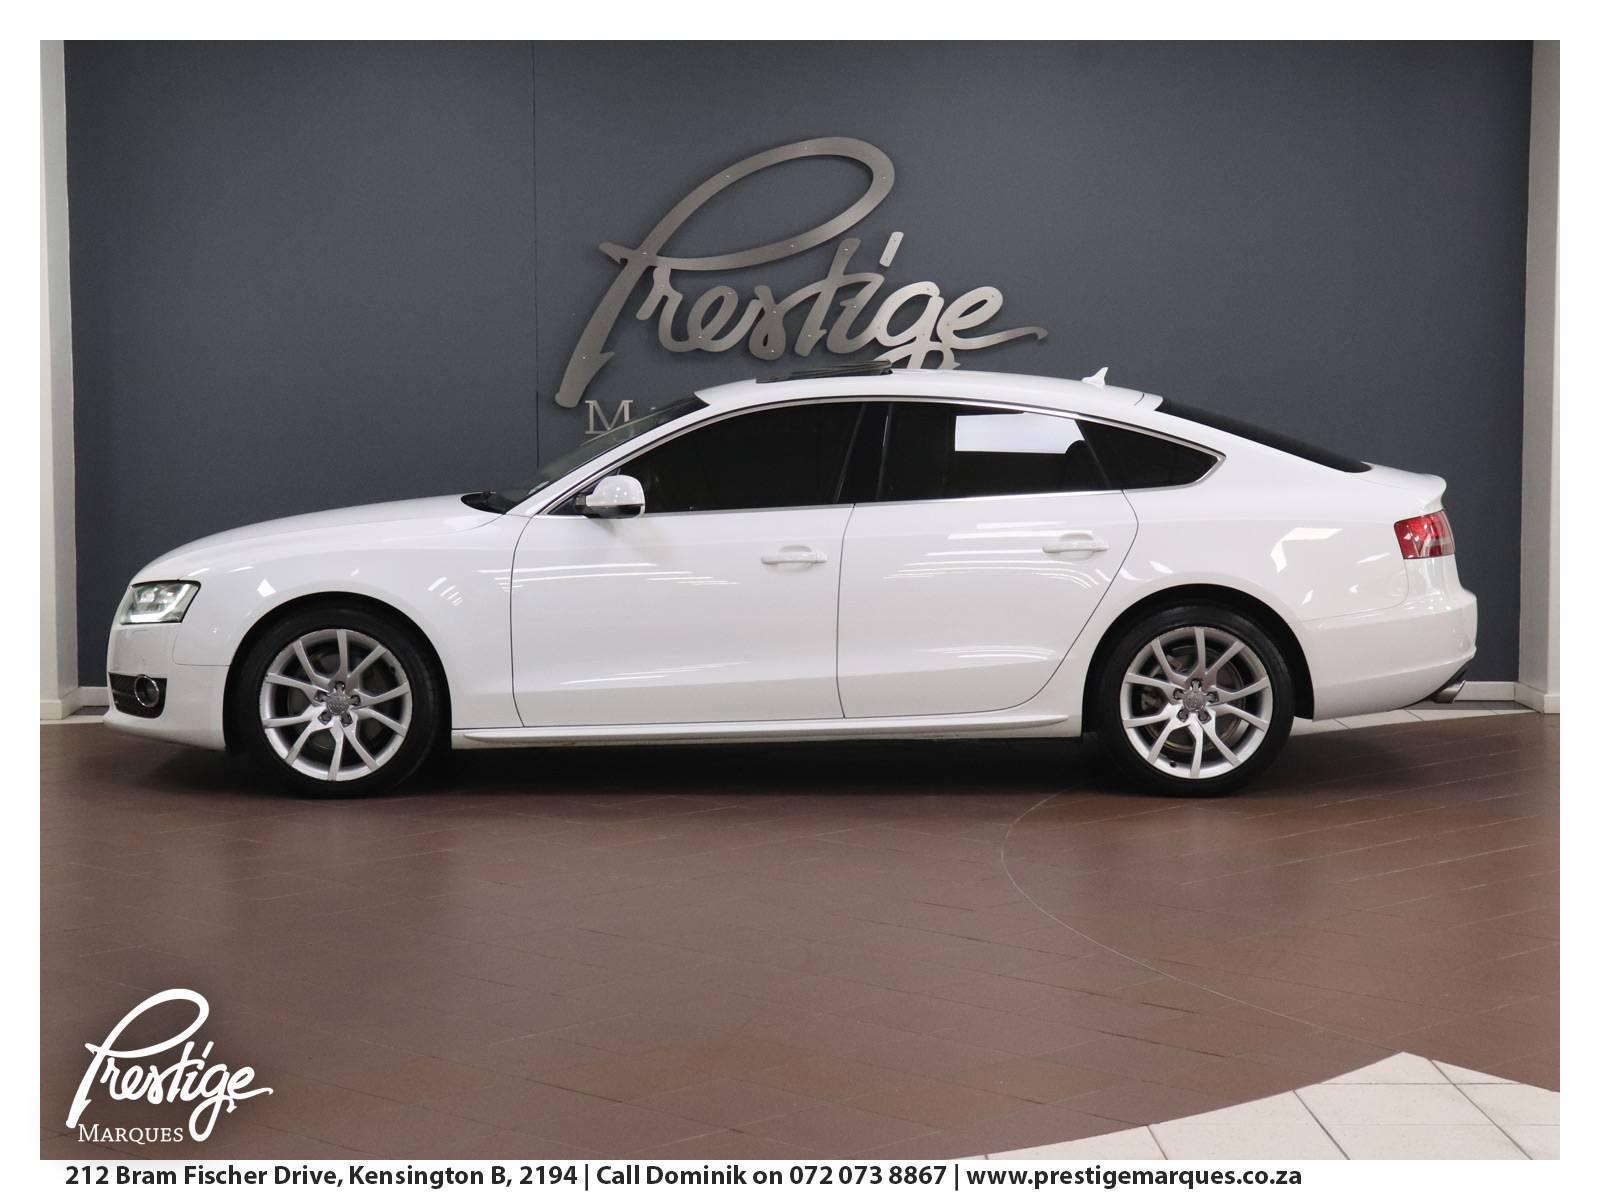 2011-Audi-A5-3.0-TDI-Quattro-Stronic-Prestige-Marques-Randburg-Sandton-5